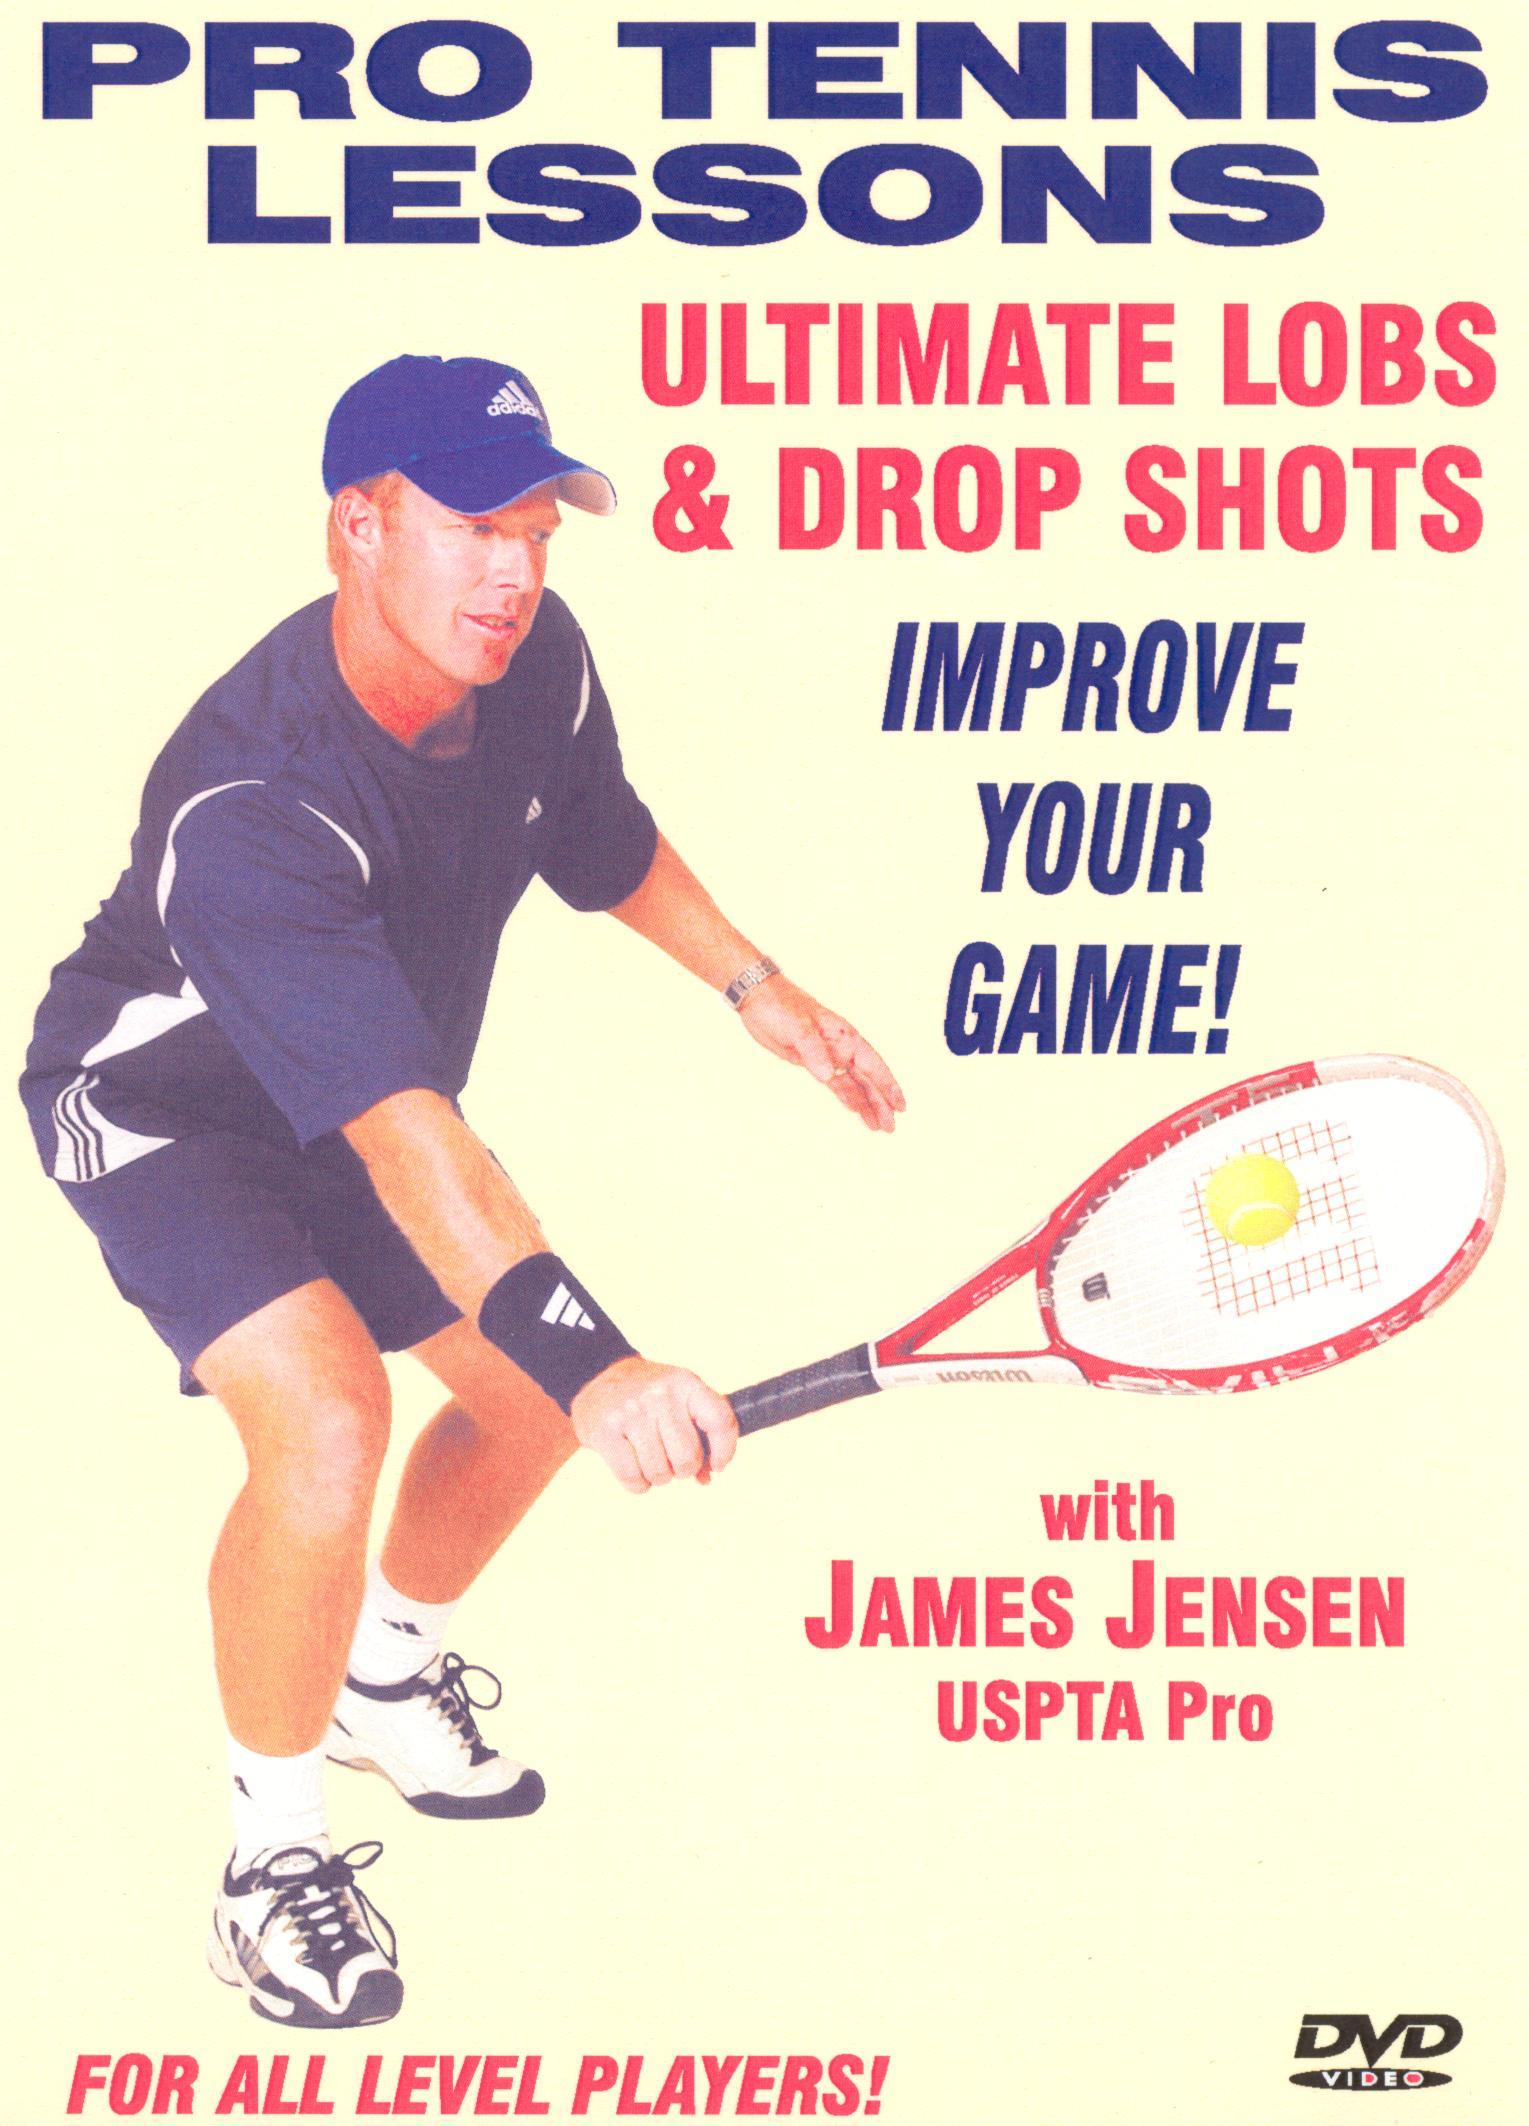 Pro Tennis Lessons: Ultimate Lobs & Drop Shots